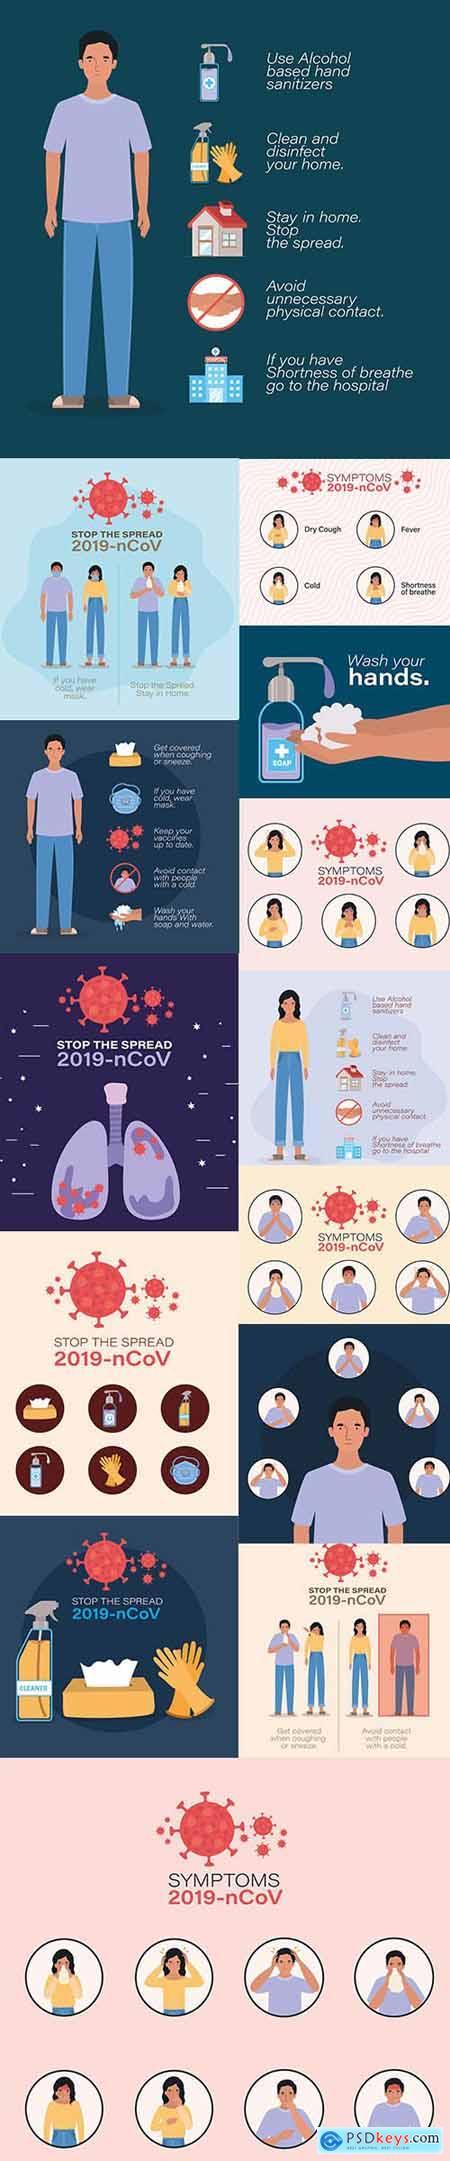 2019 Ncov Virus Symptoms Design Covid-19 Coronavirus Infection